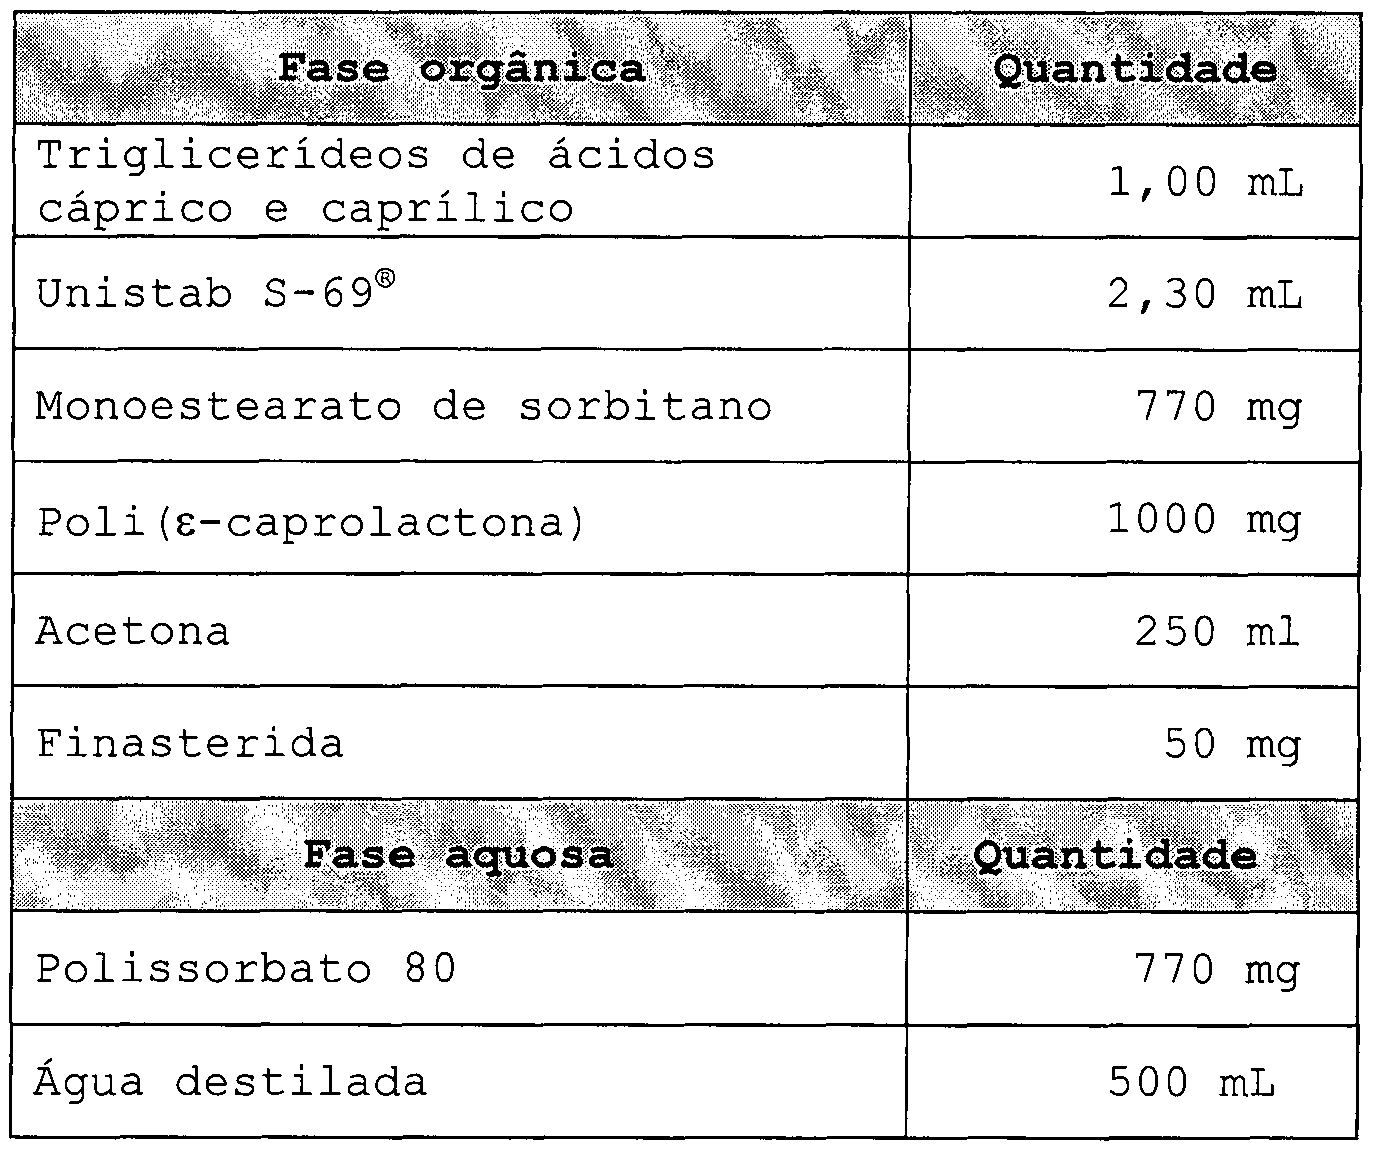 plavix generic available